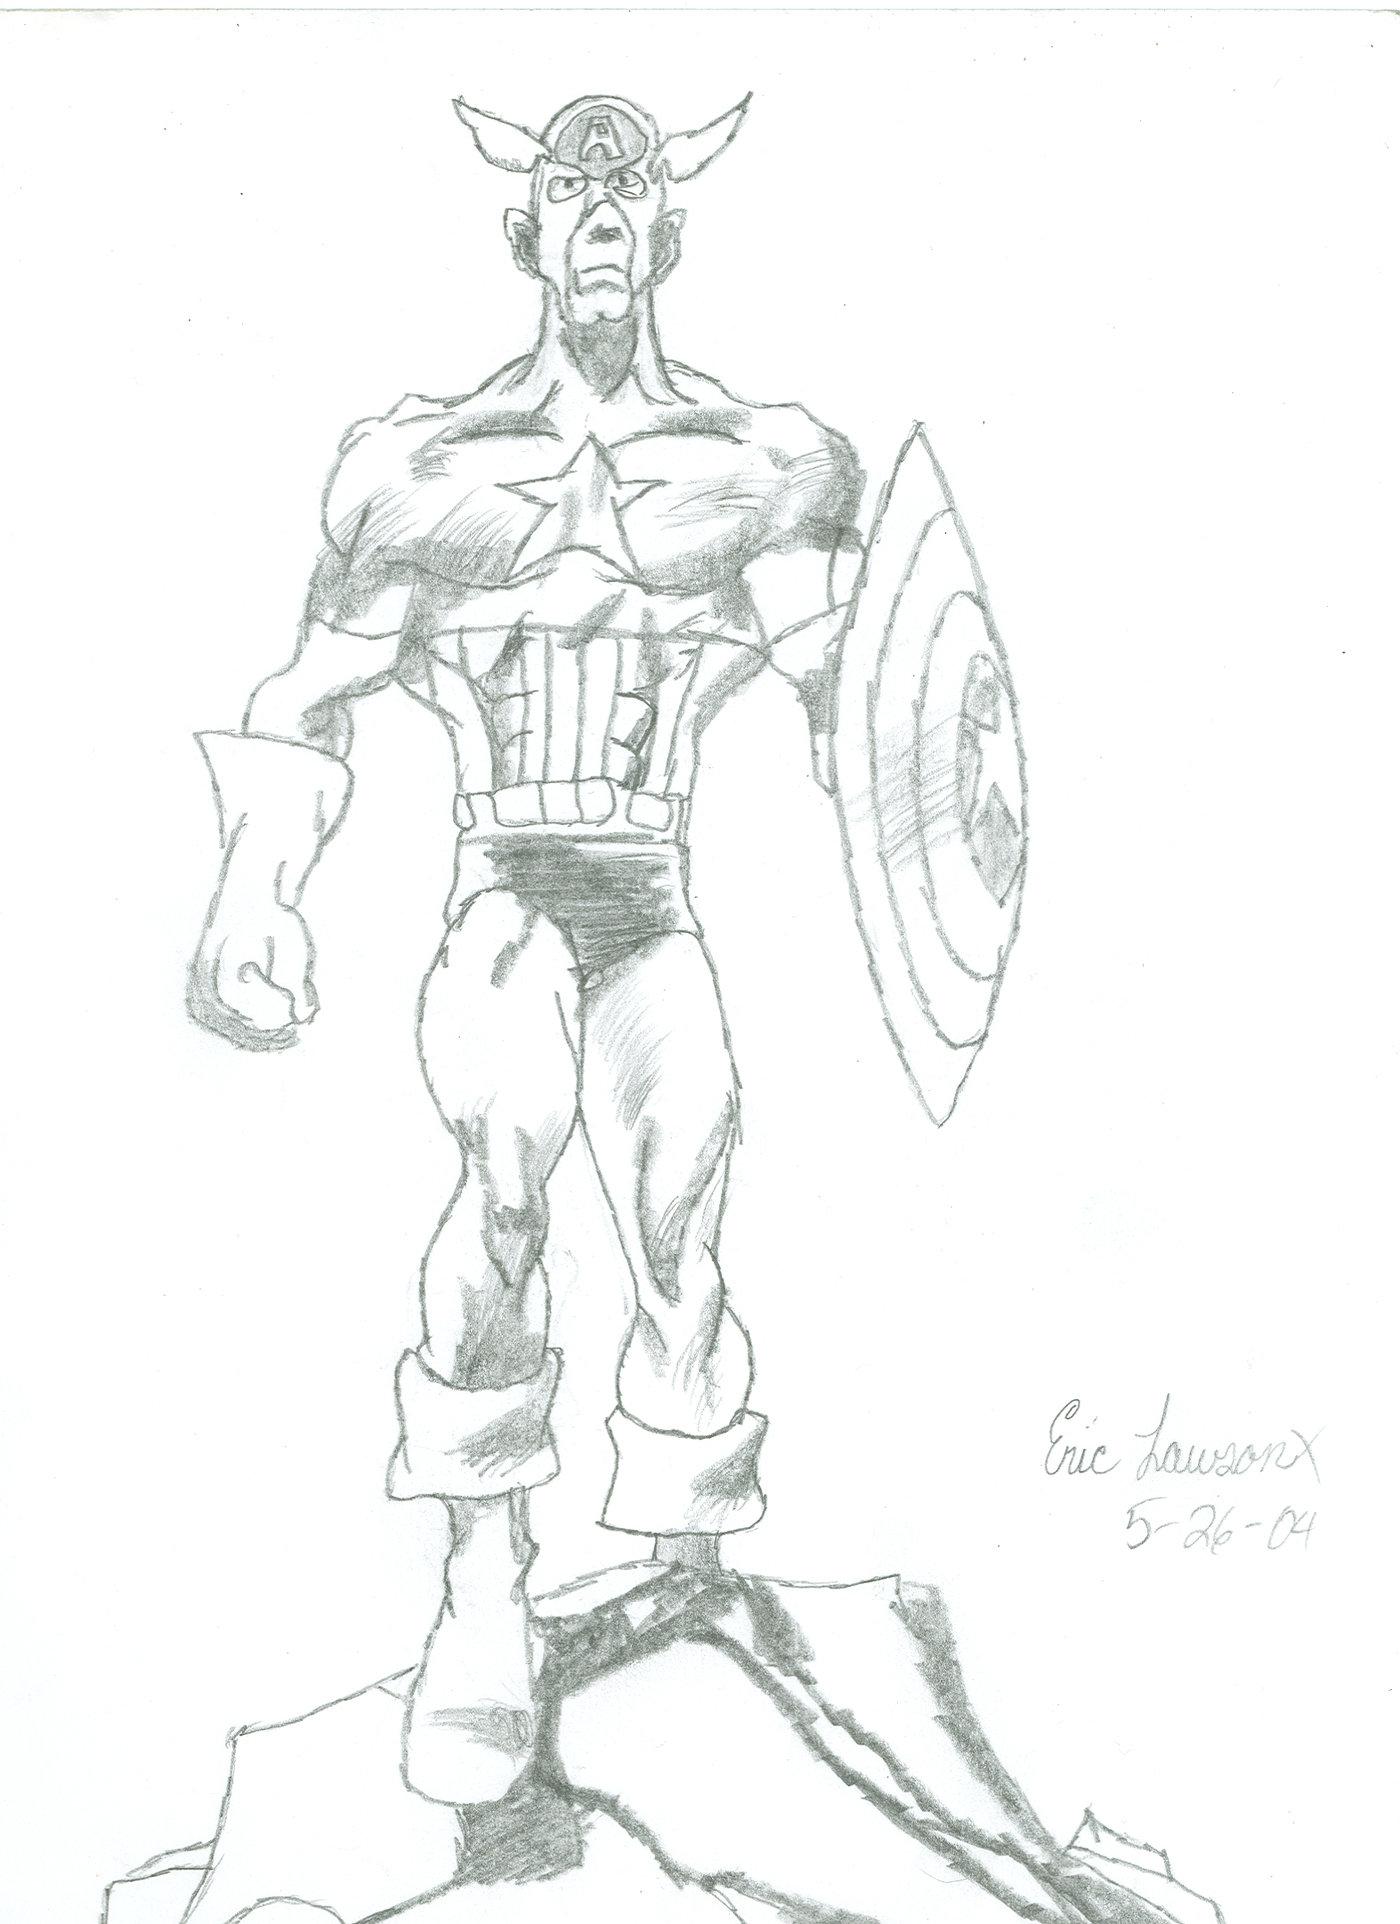 Drawing Illustrations by Eric Lawson at Coroflot.com